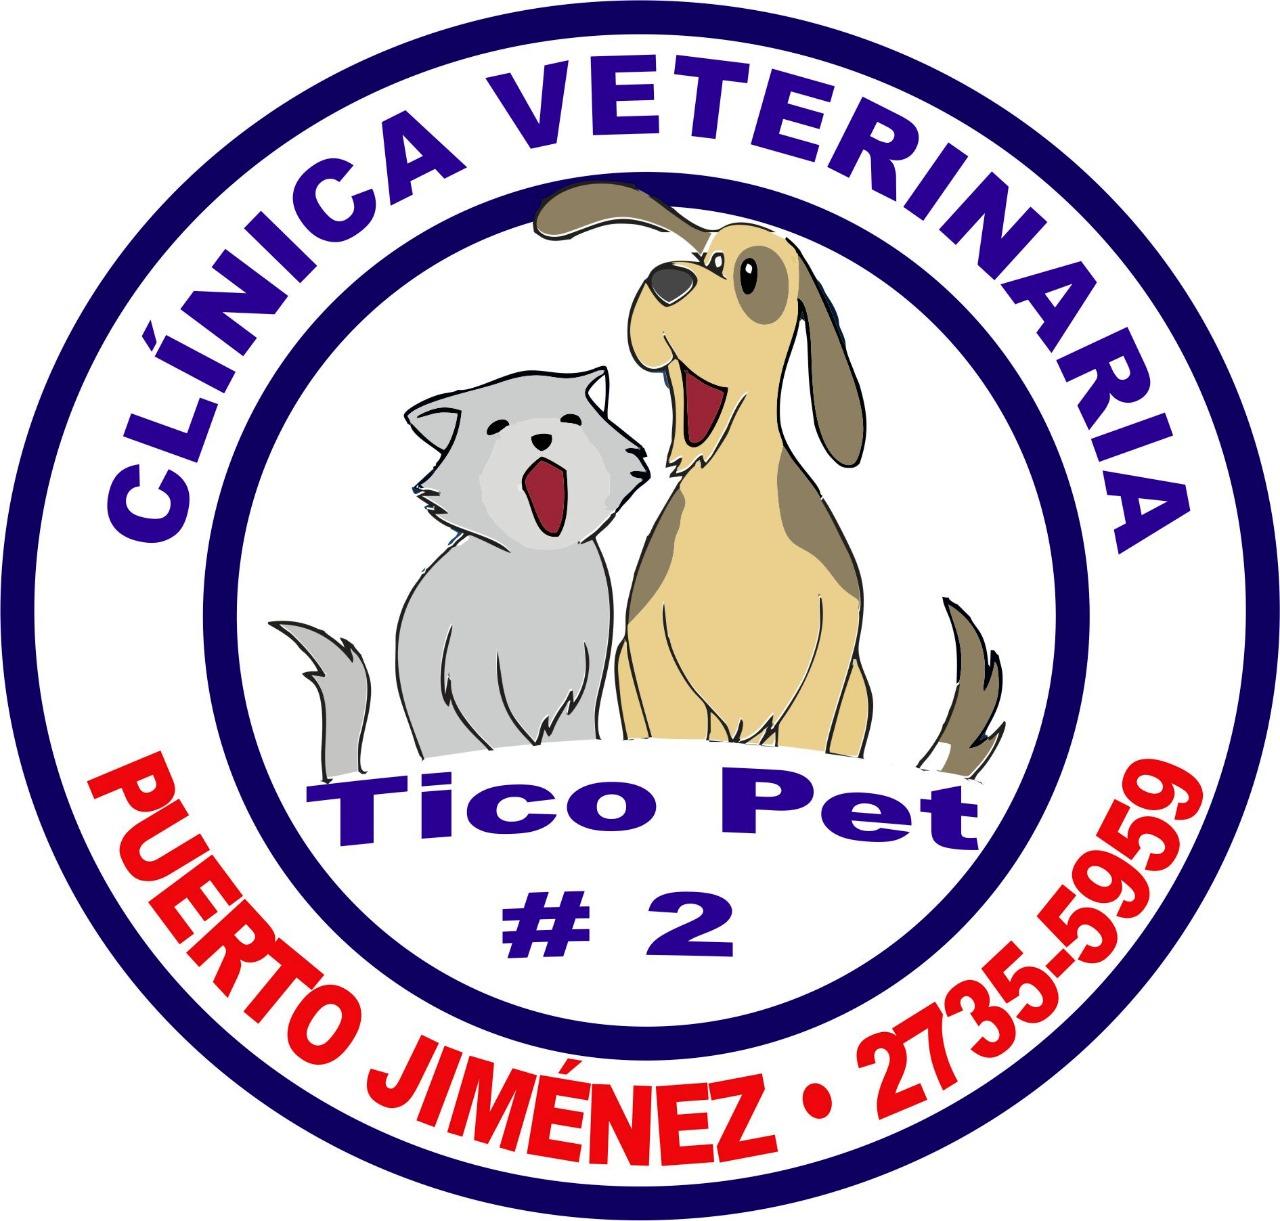 ClinicaVeterinaria.jpeg